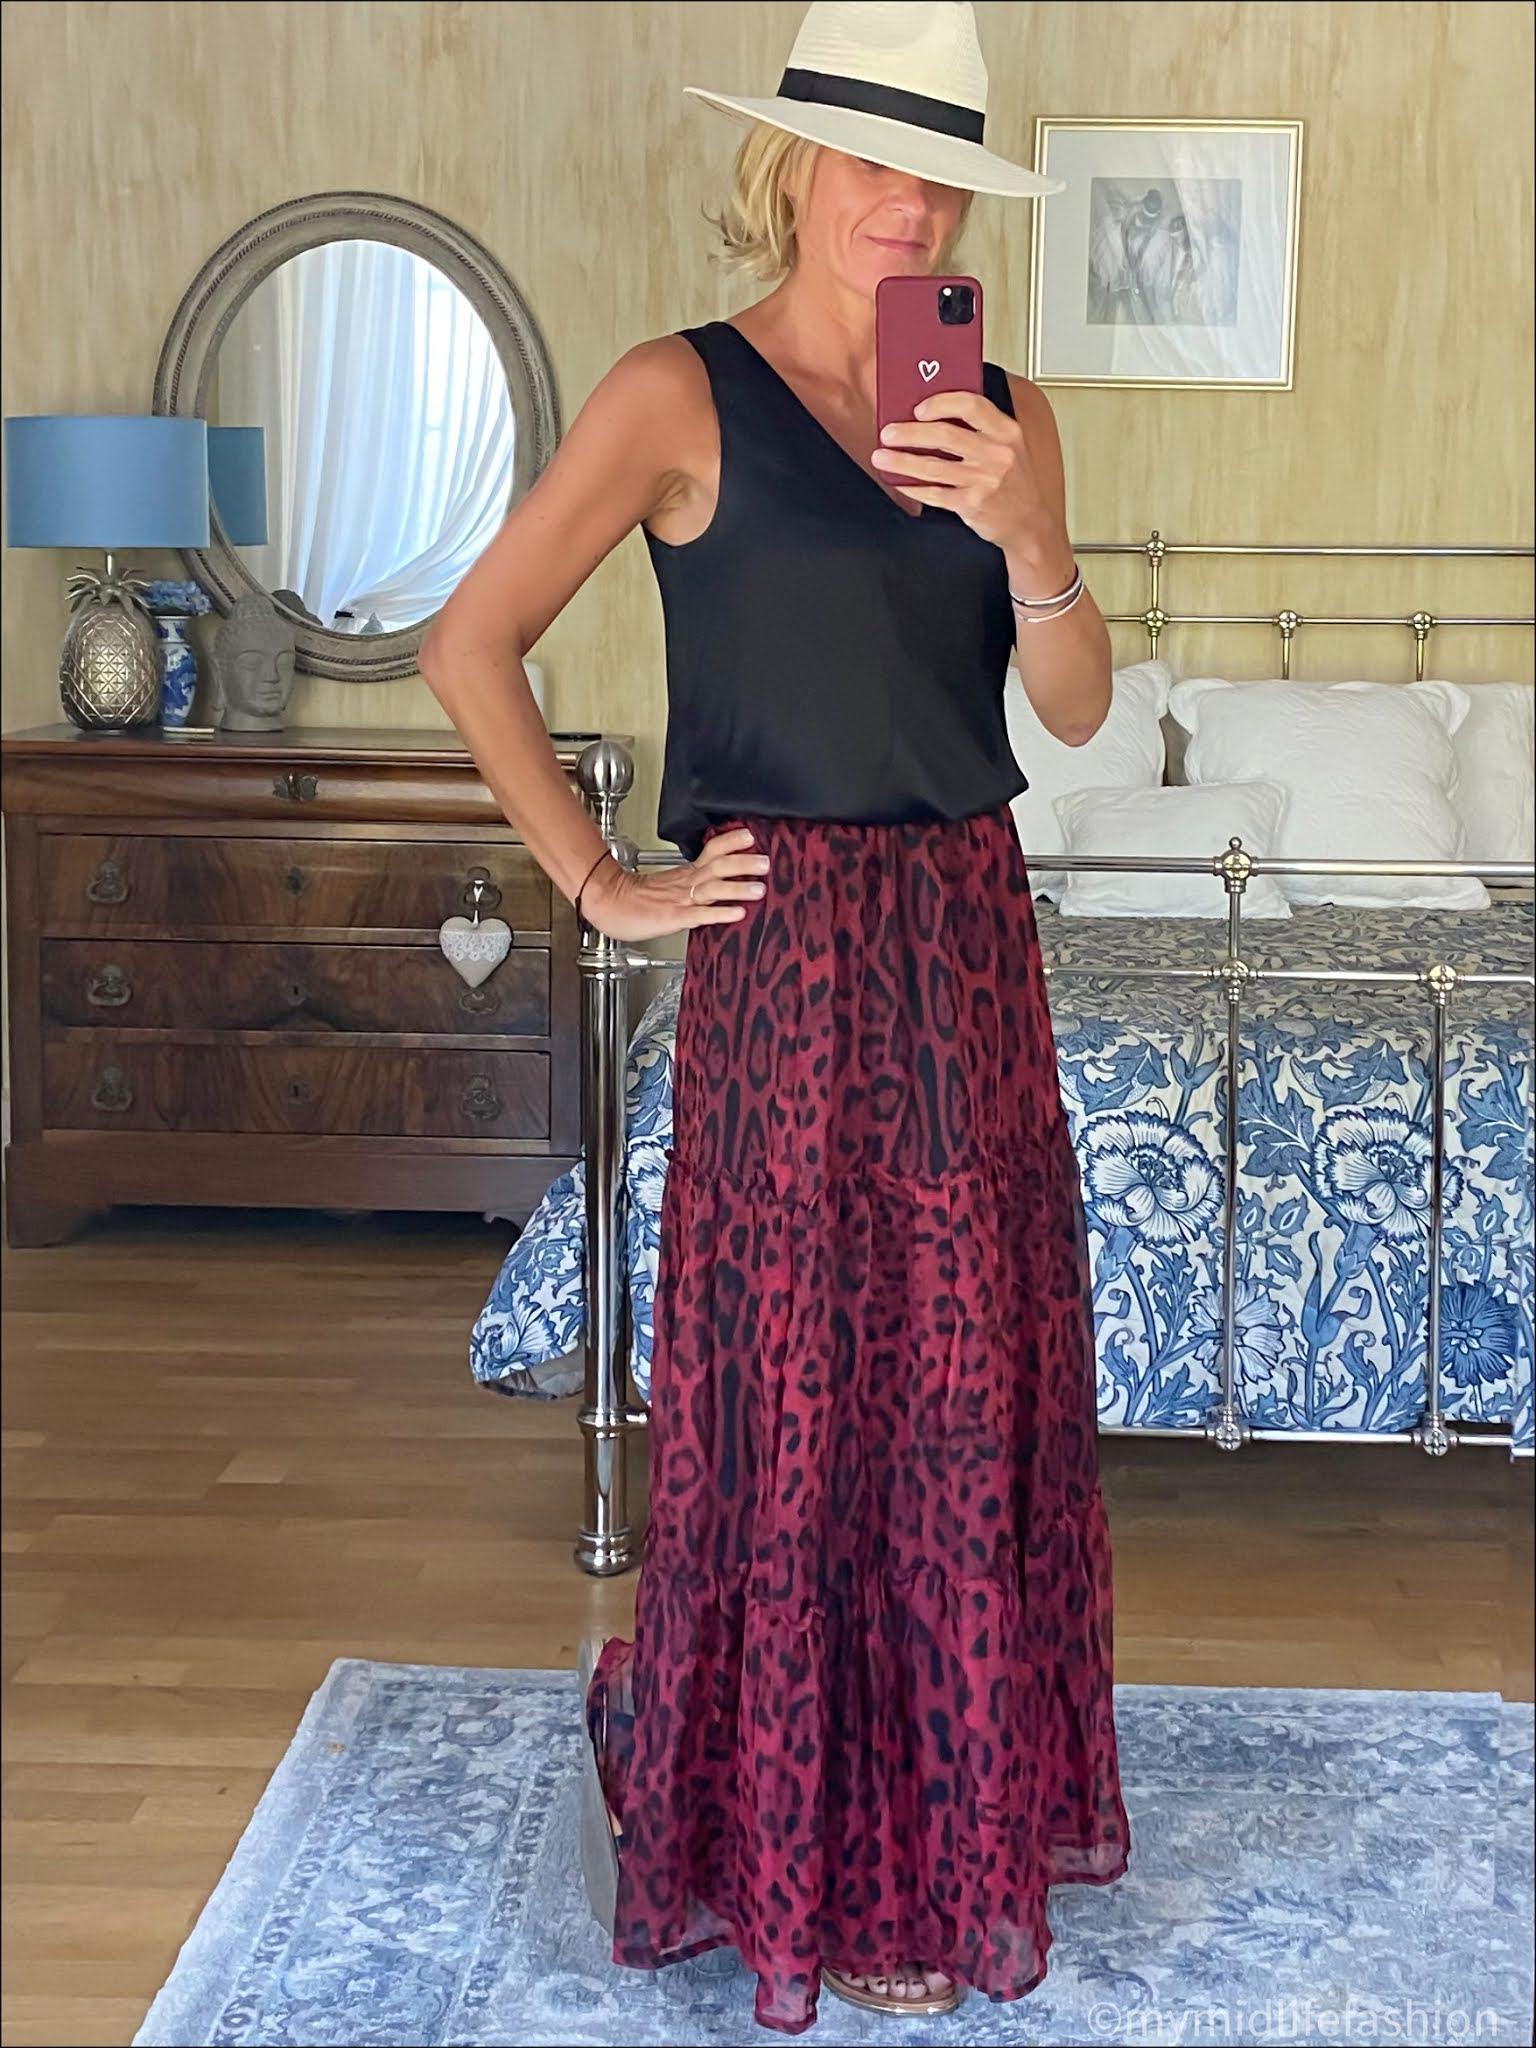 my midlife fashion, Zara Panama hat, Marks and Spencer silk top, Ridley London leopard print maxi tiered skirt, carvela karafe sandals